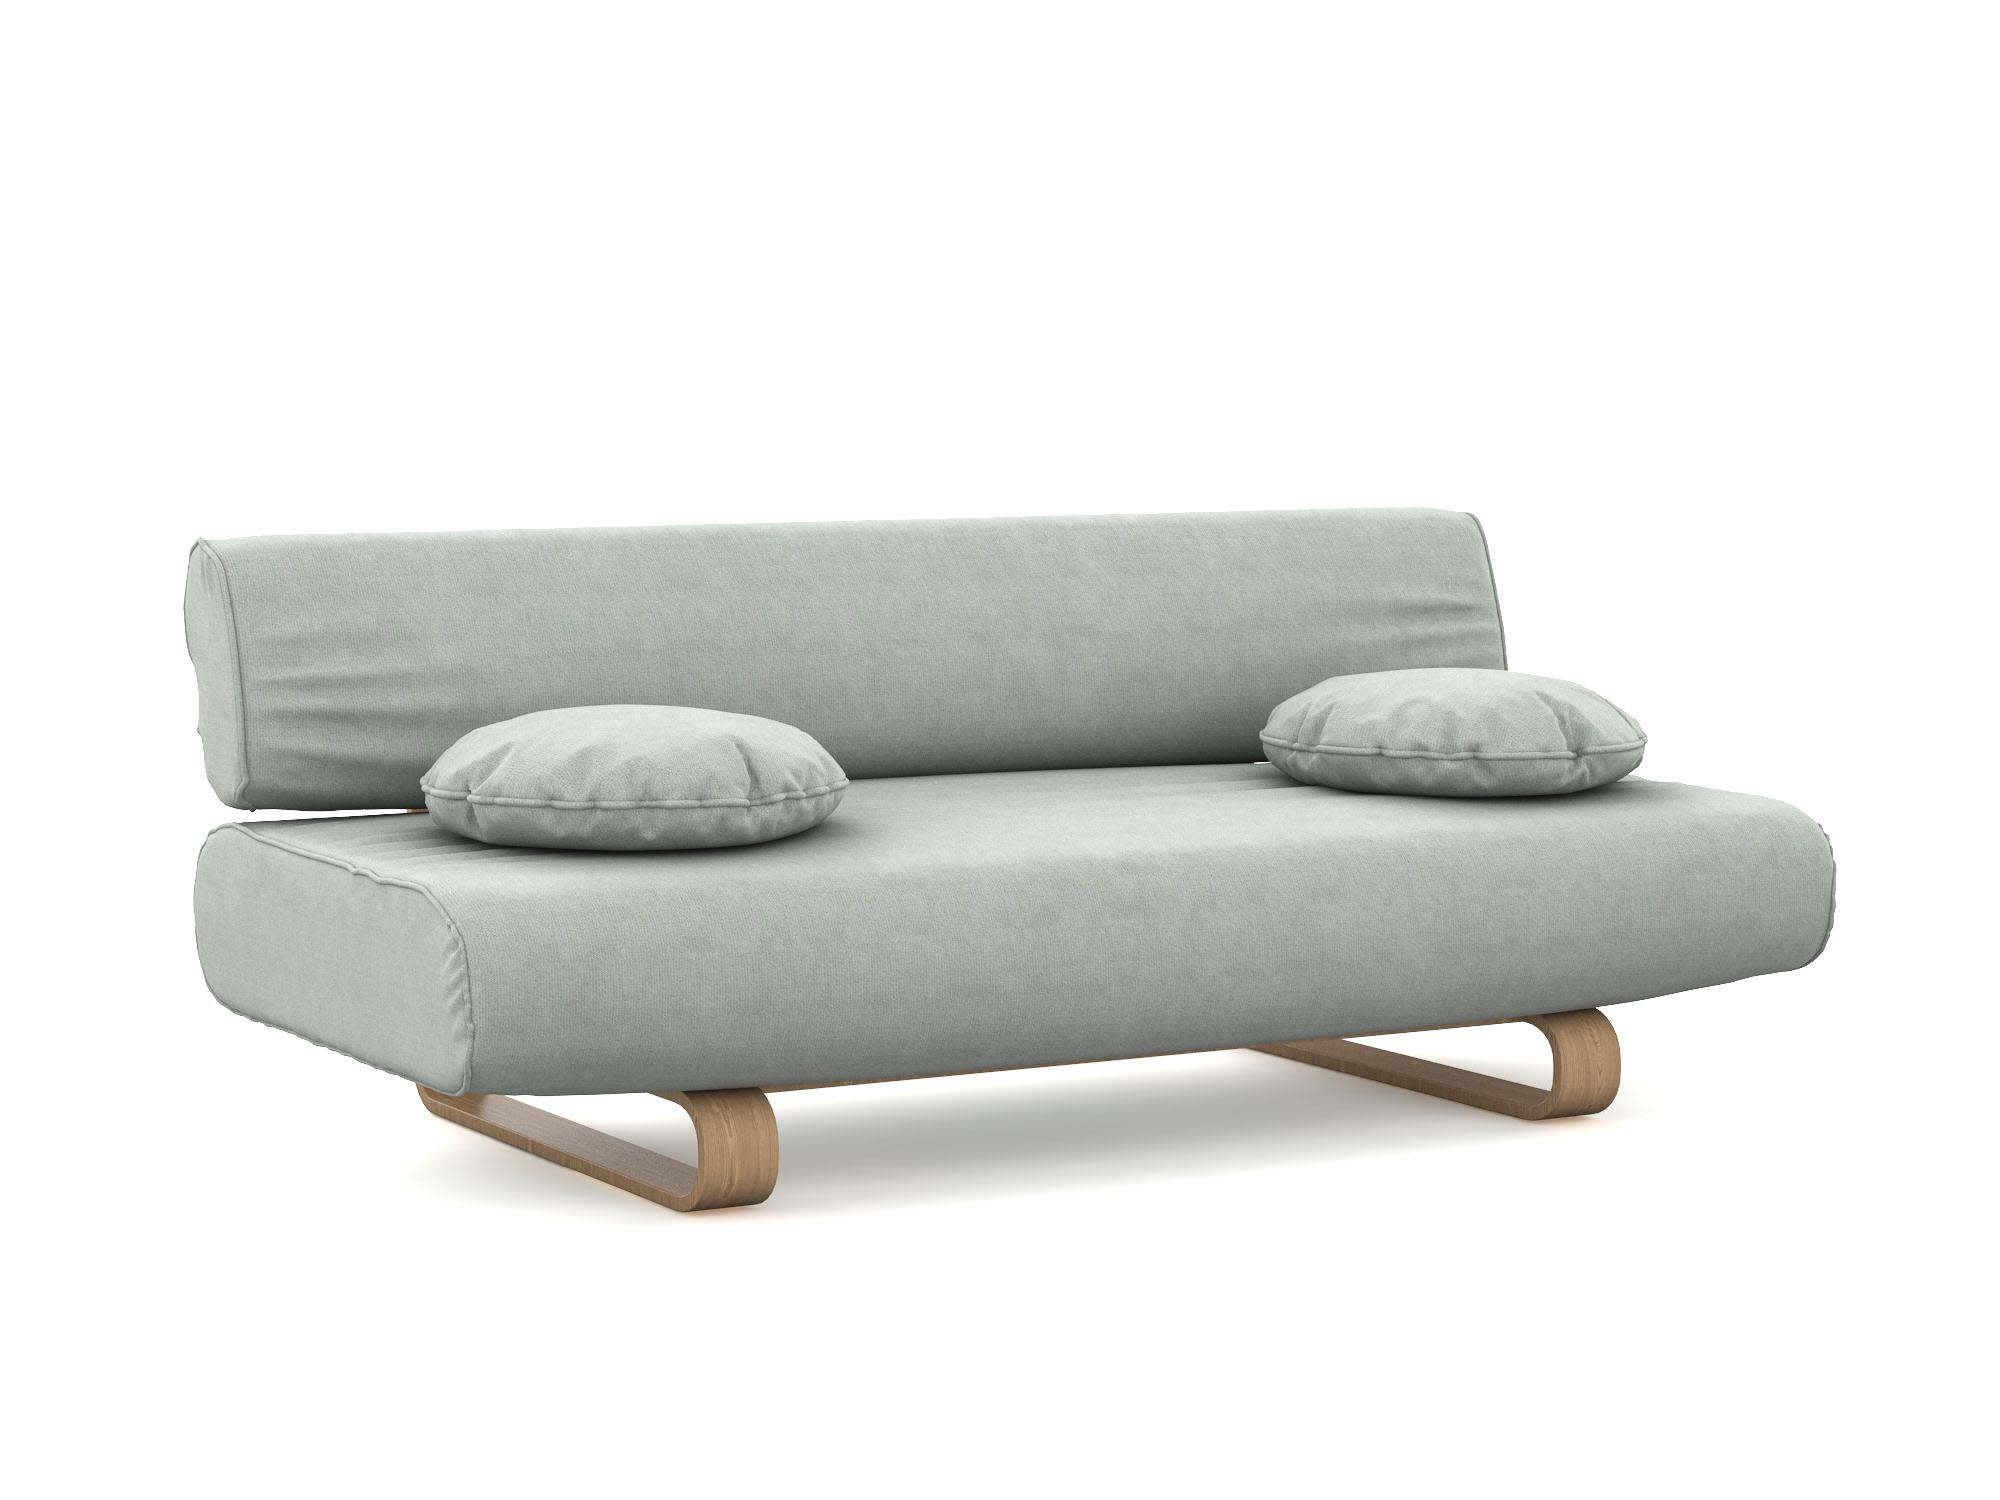 bezug sofa good sofa ikea sofa ikea klippan bezug with bezug sofa cheap fantastisch eckcouch. Black Bedroom Furniture Sets. Home Design Ideas